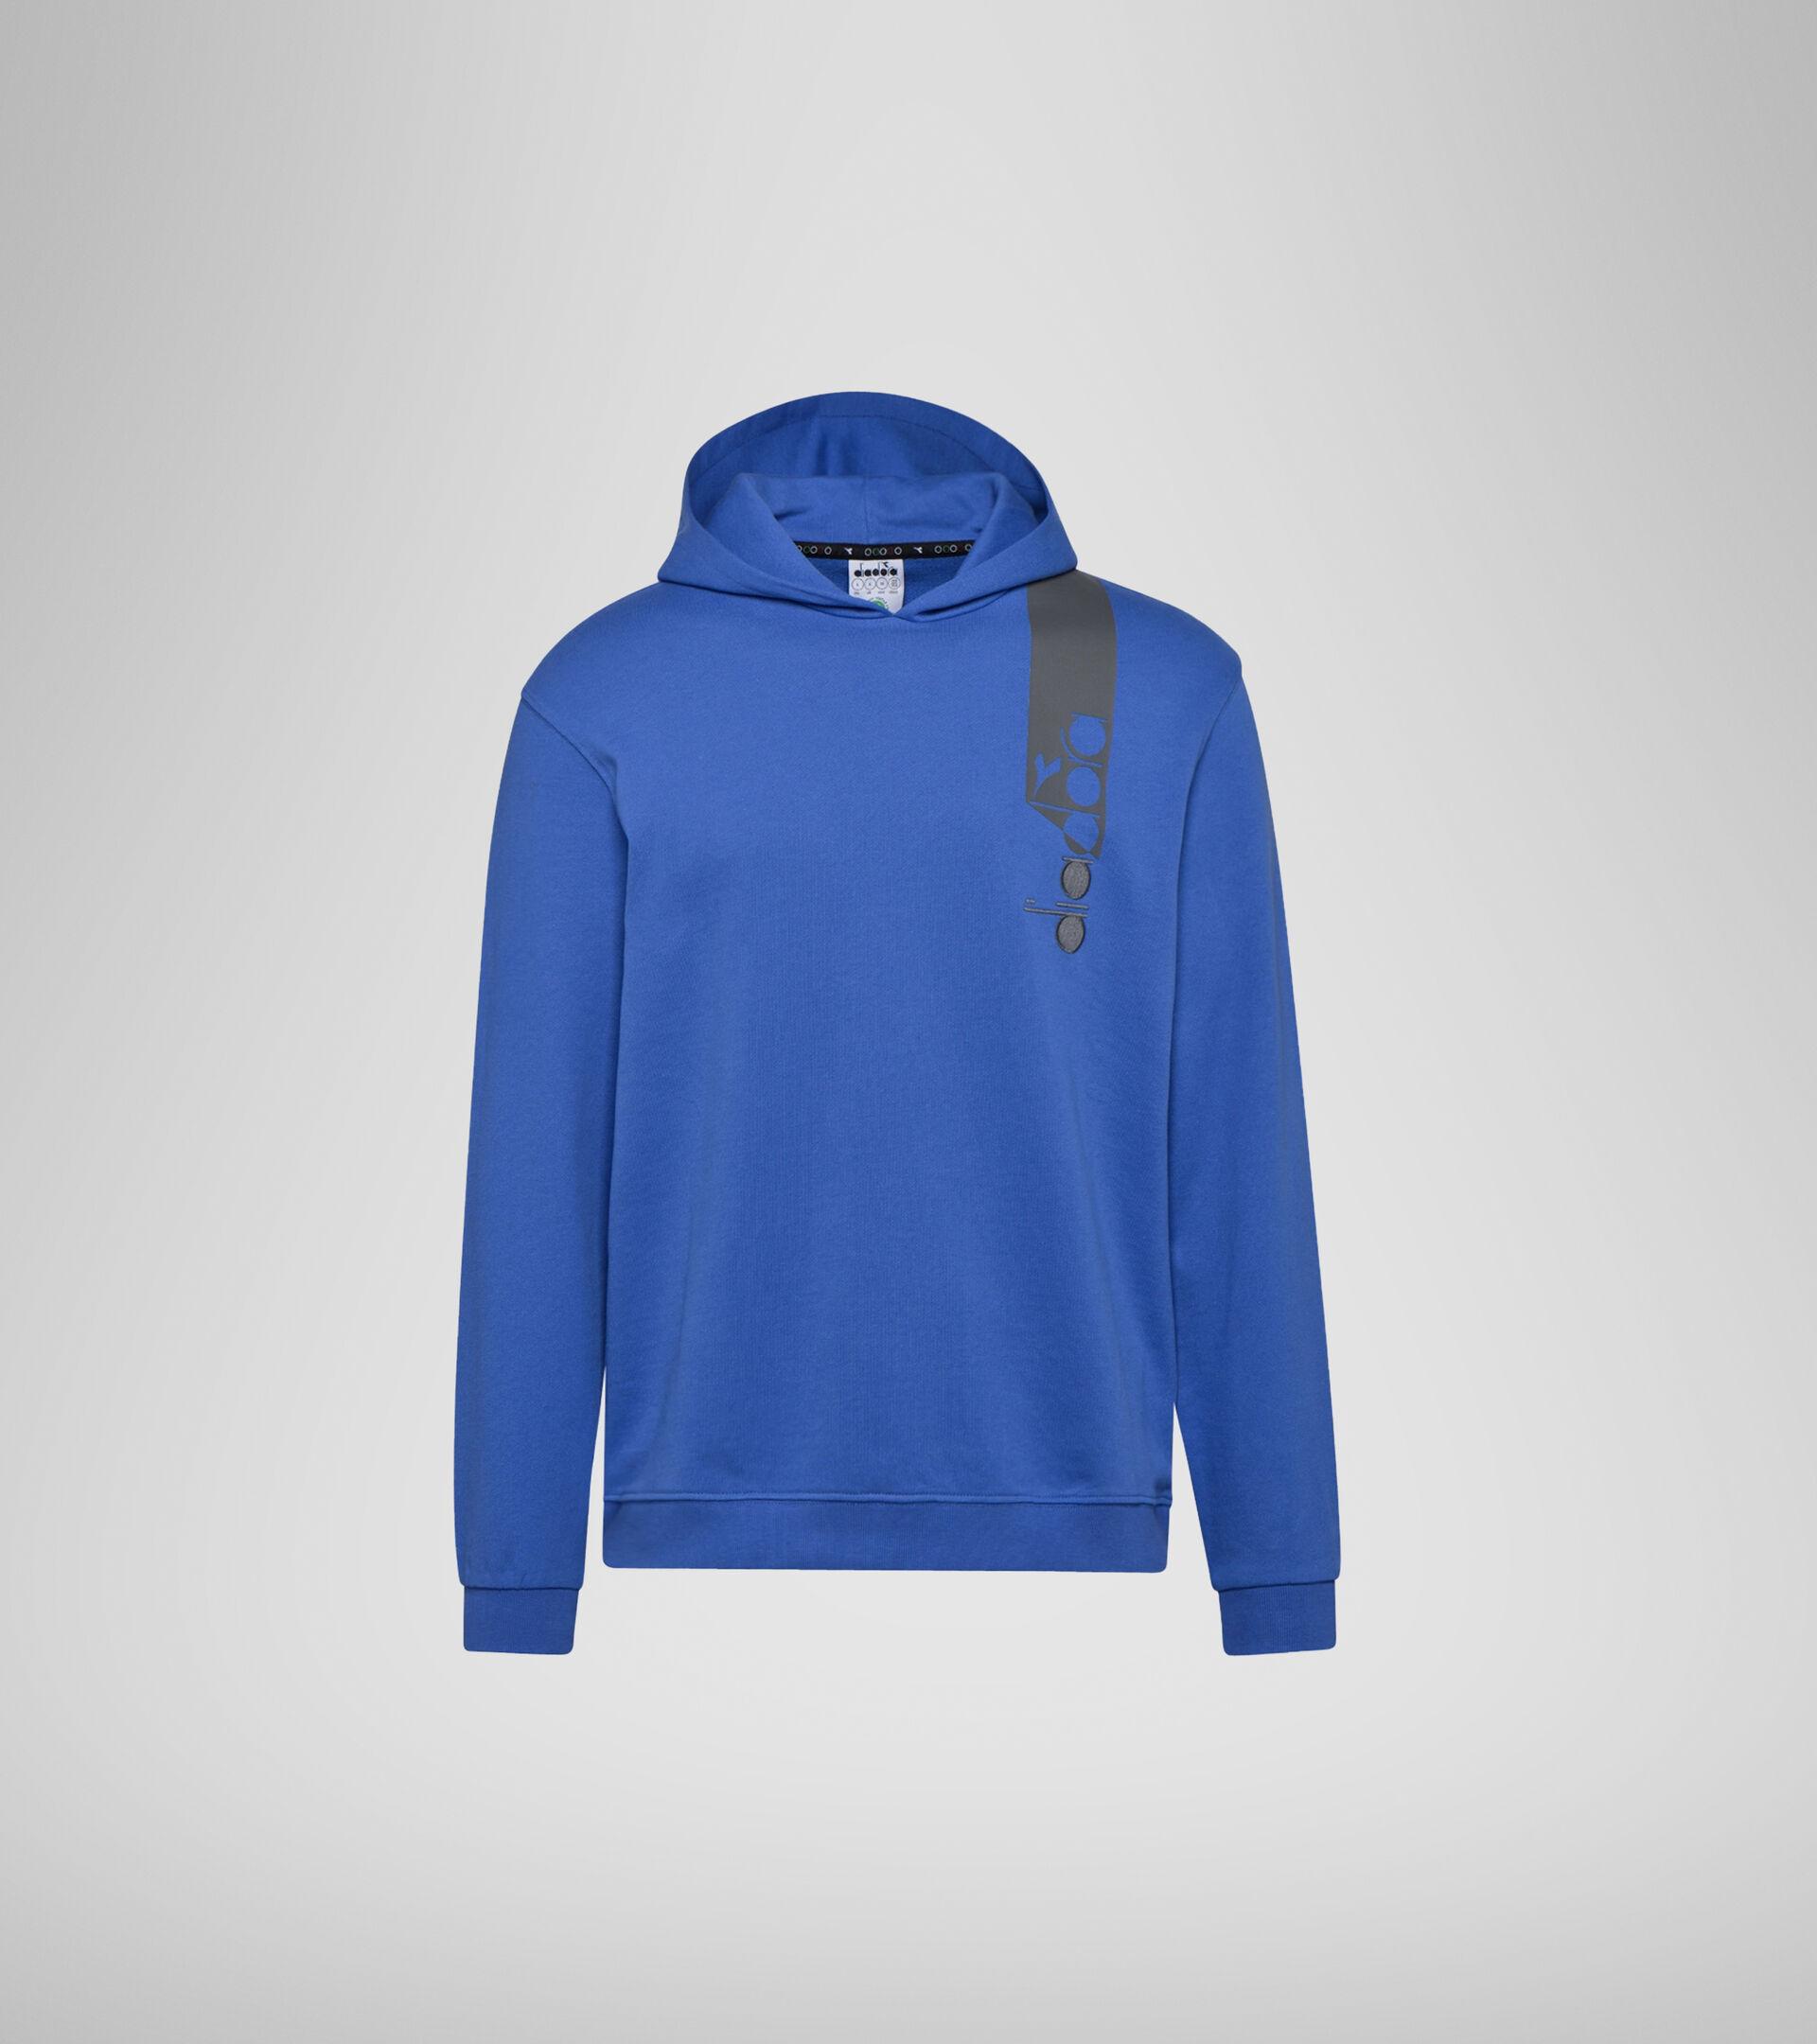 Apparel Sportswear UOMO HOODIE ICON BLUE PERSIA Diadora